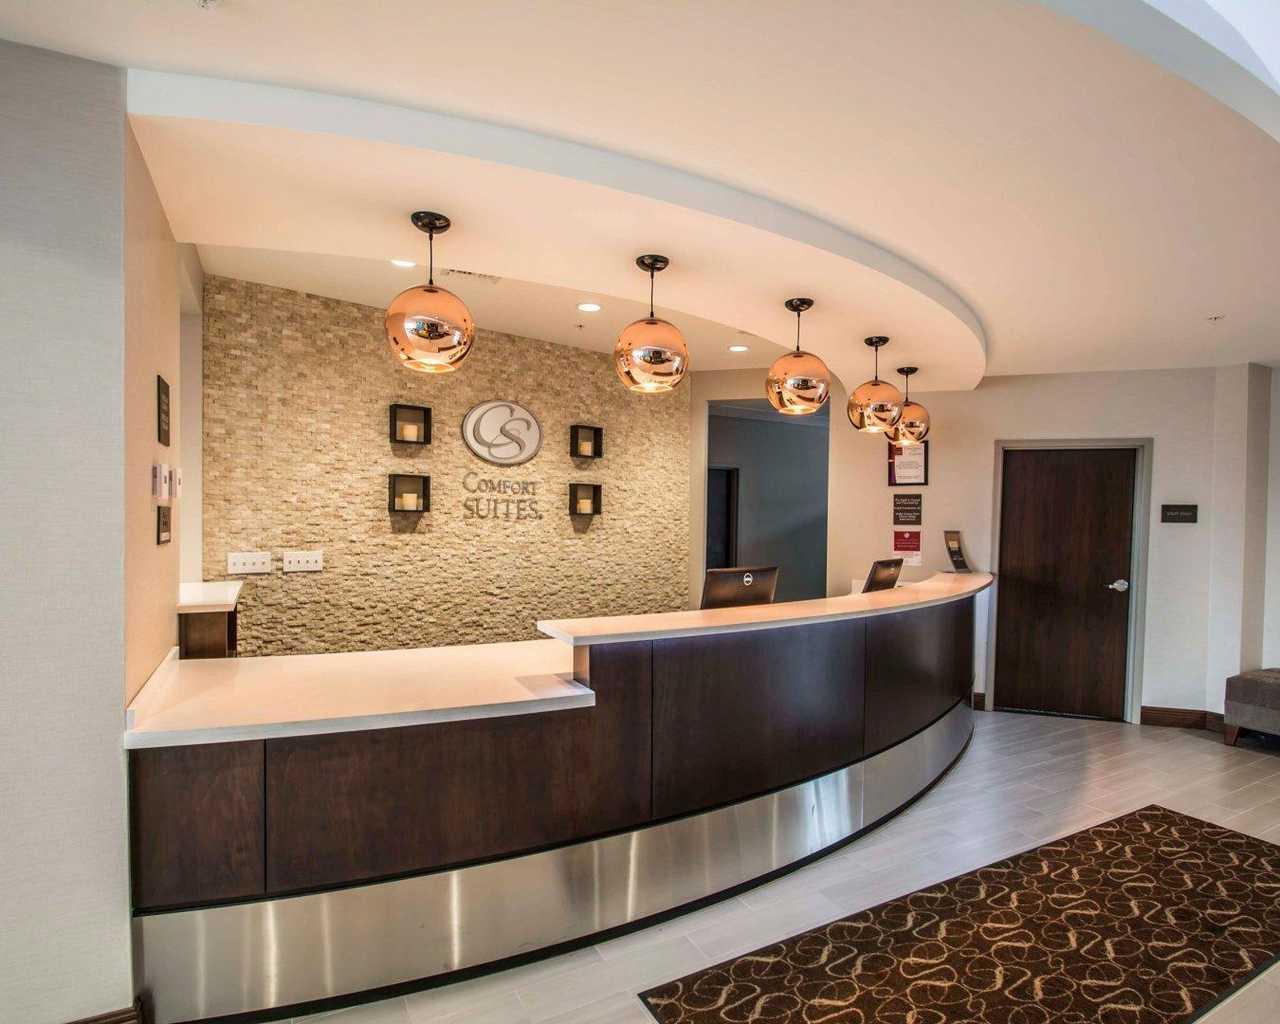 berlin suites prices information reviews west hotel featured room image city ohio ibis z comfort hotels comforter deals expedia